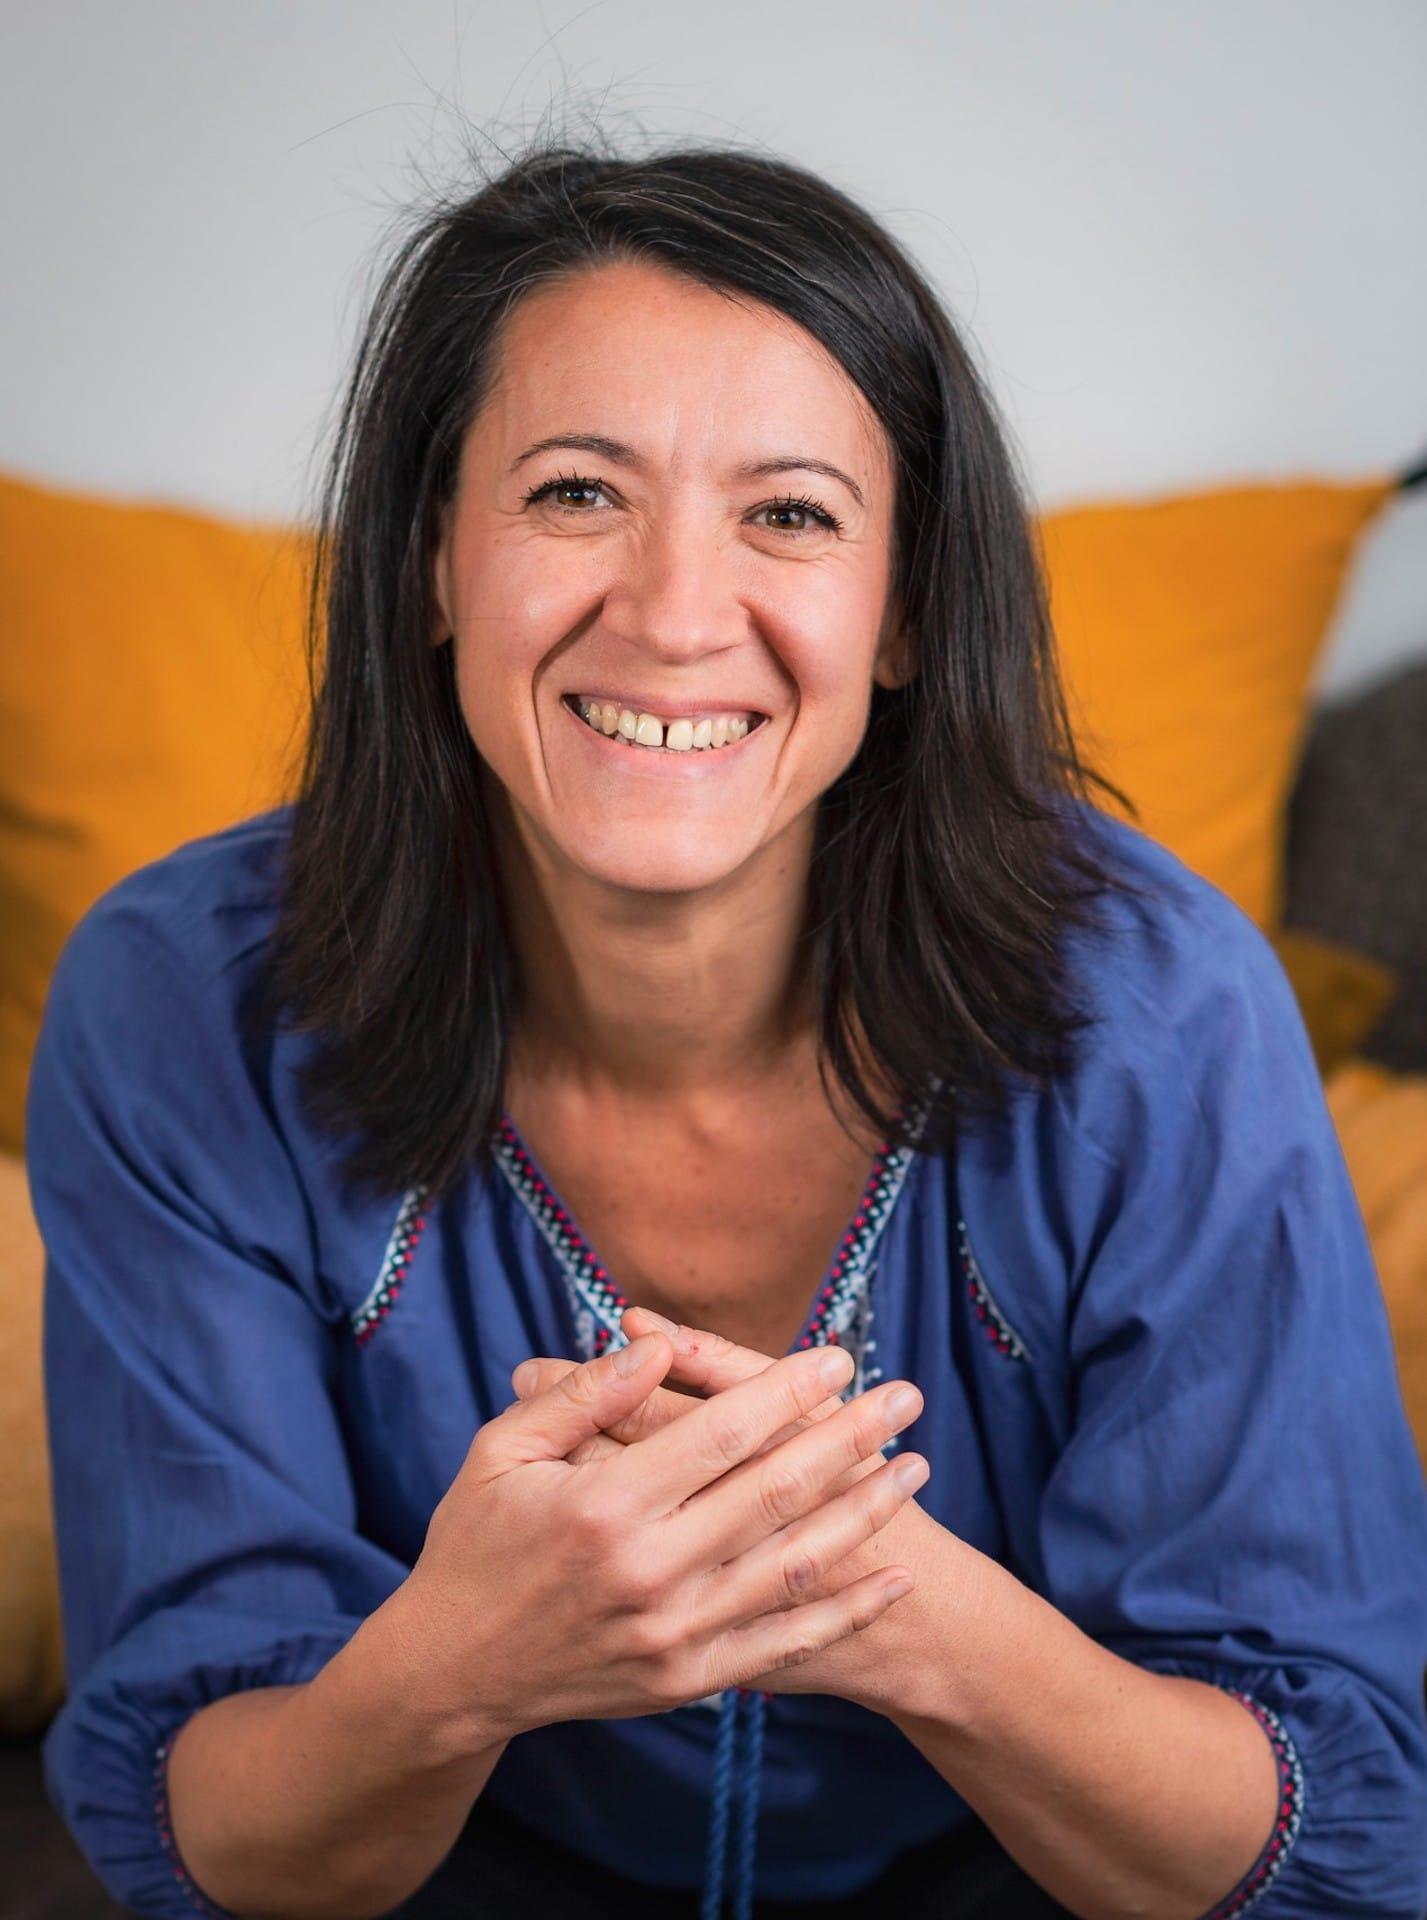 2020-12-08-Sylvie Berthonneau-057-Alkana Francois Dhoury (2)